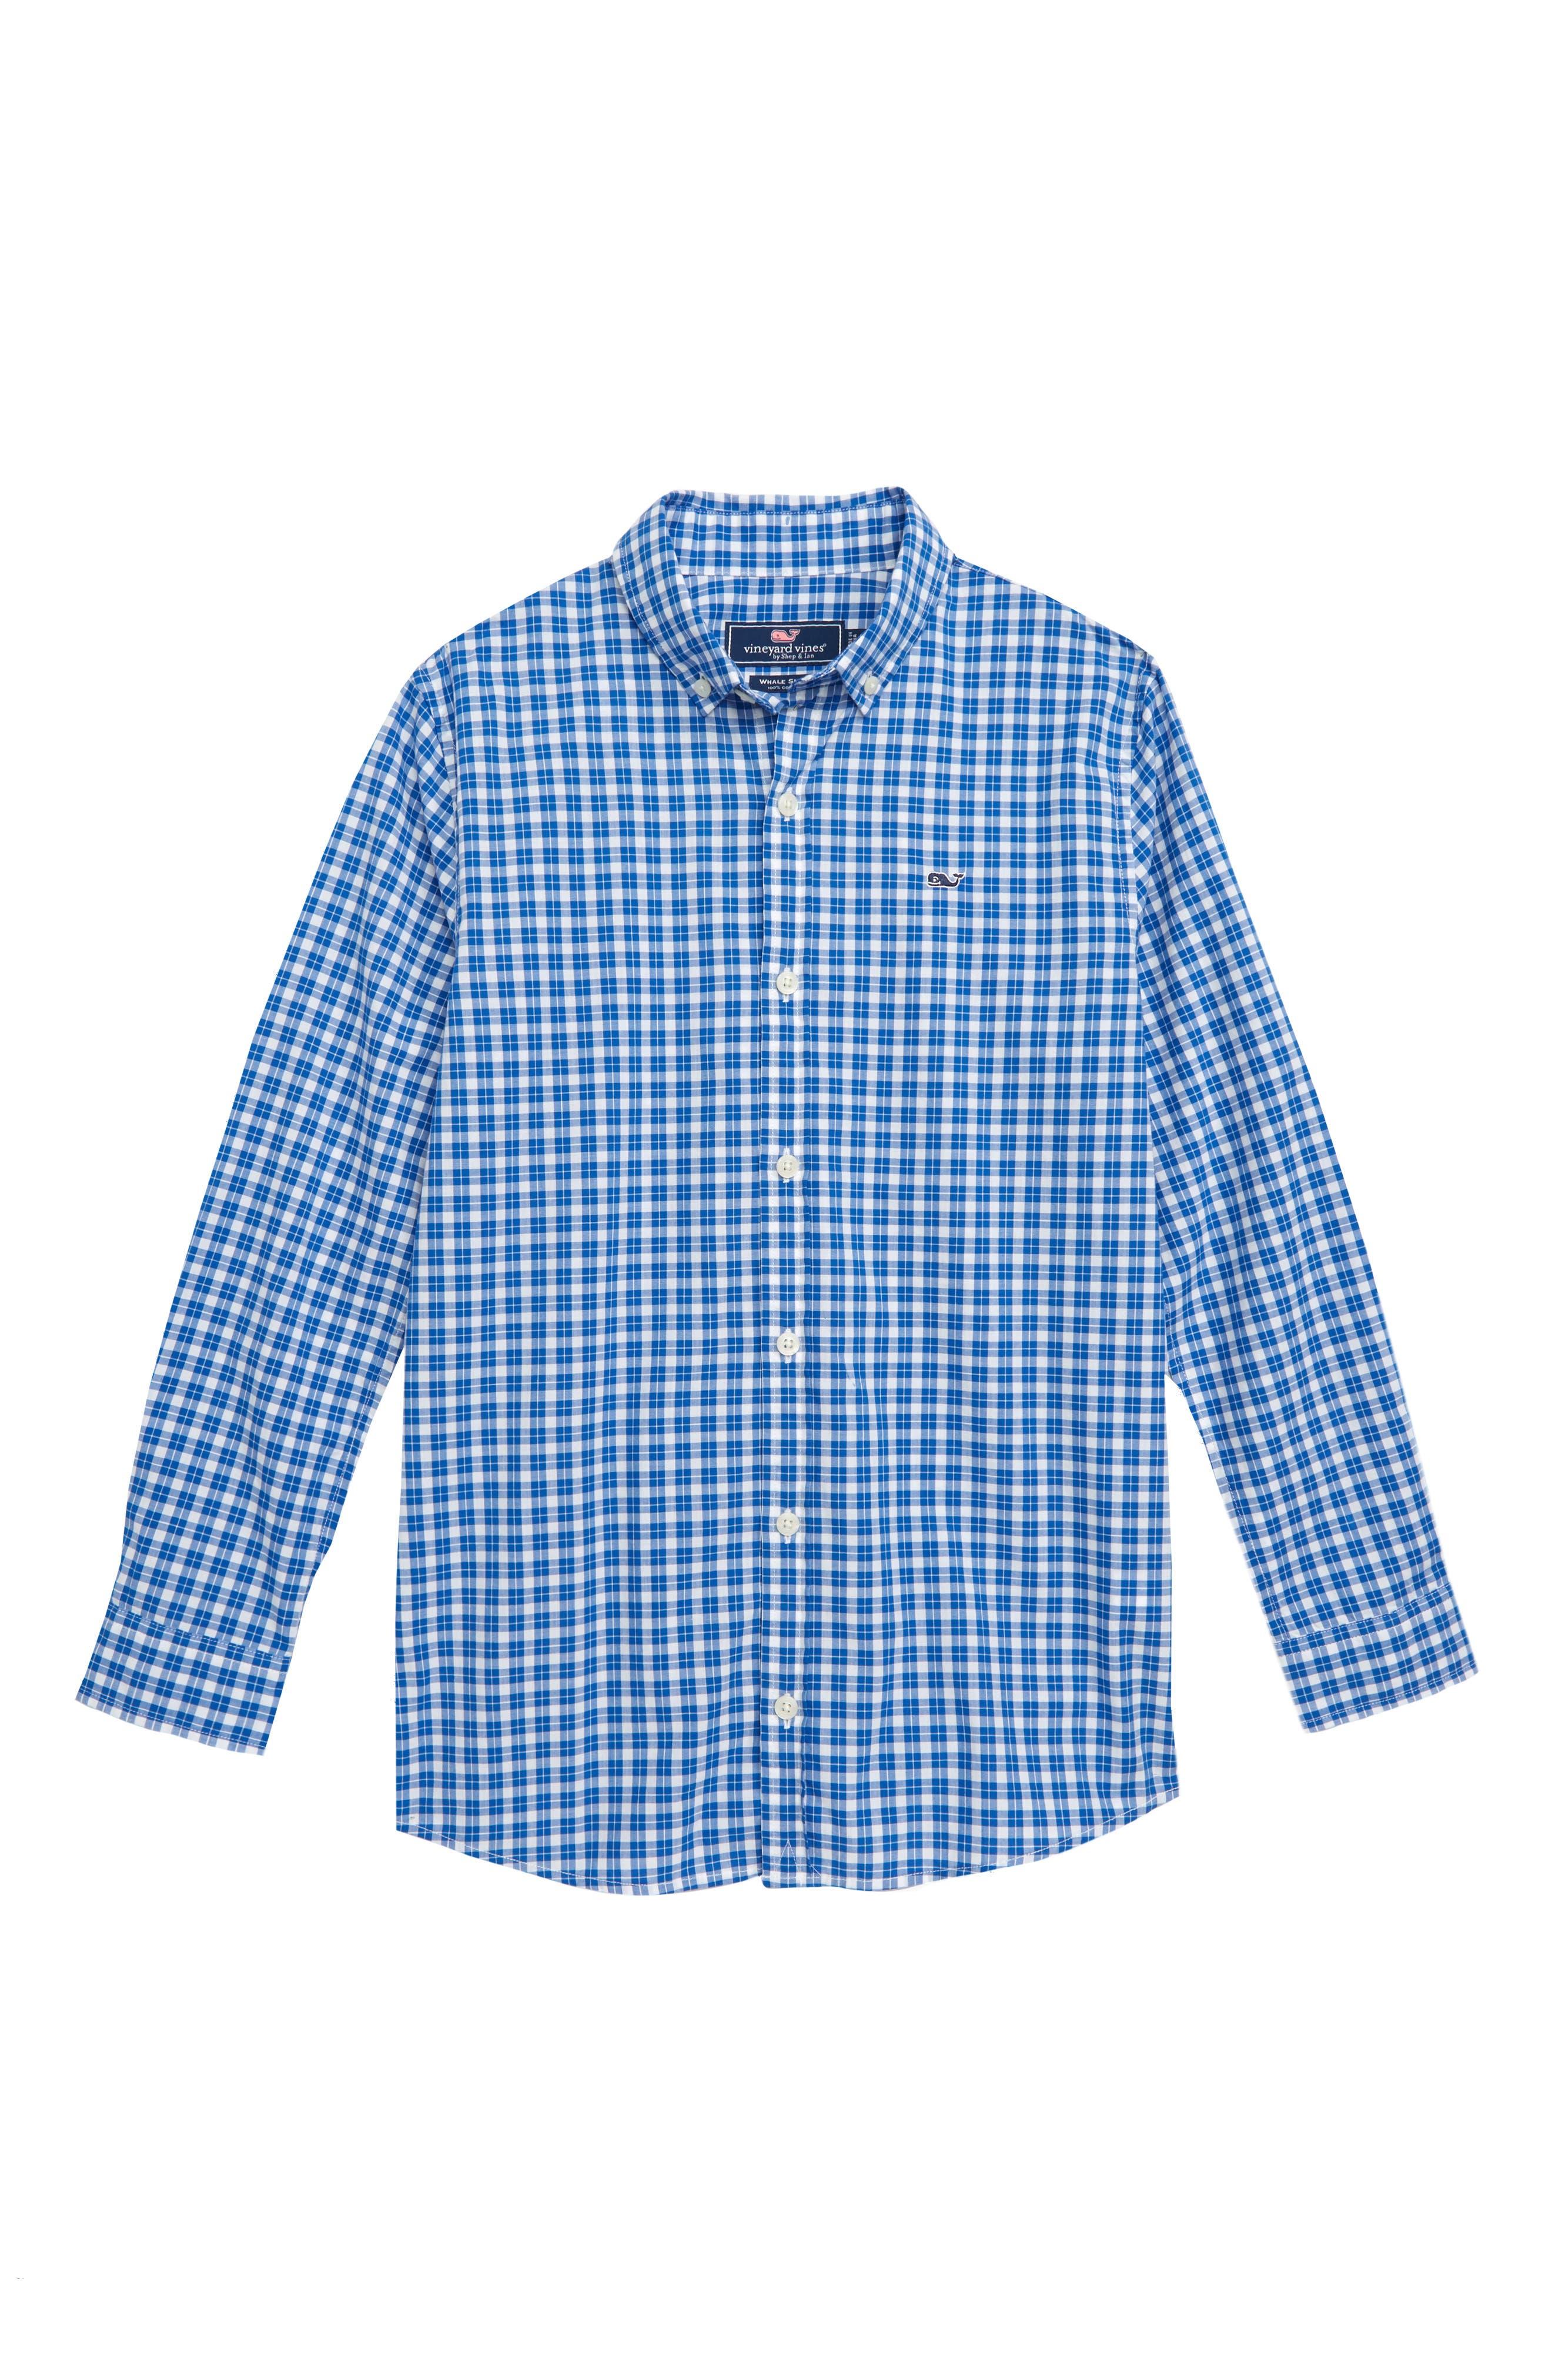 Eagle Hill Poplin Whale Shirt,                             Main thumbnail 1, color,                             YACHT BLUE